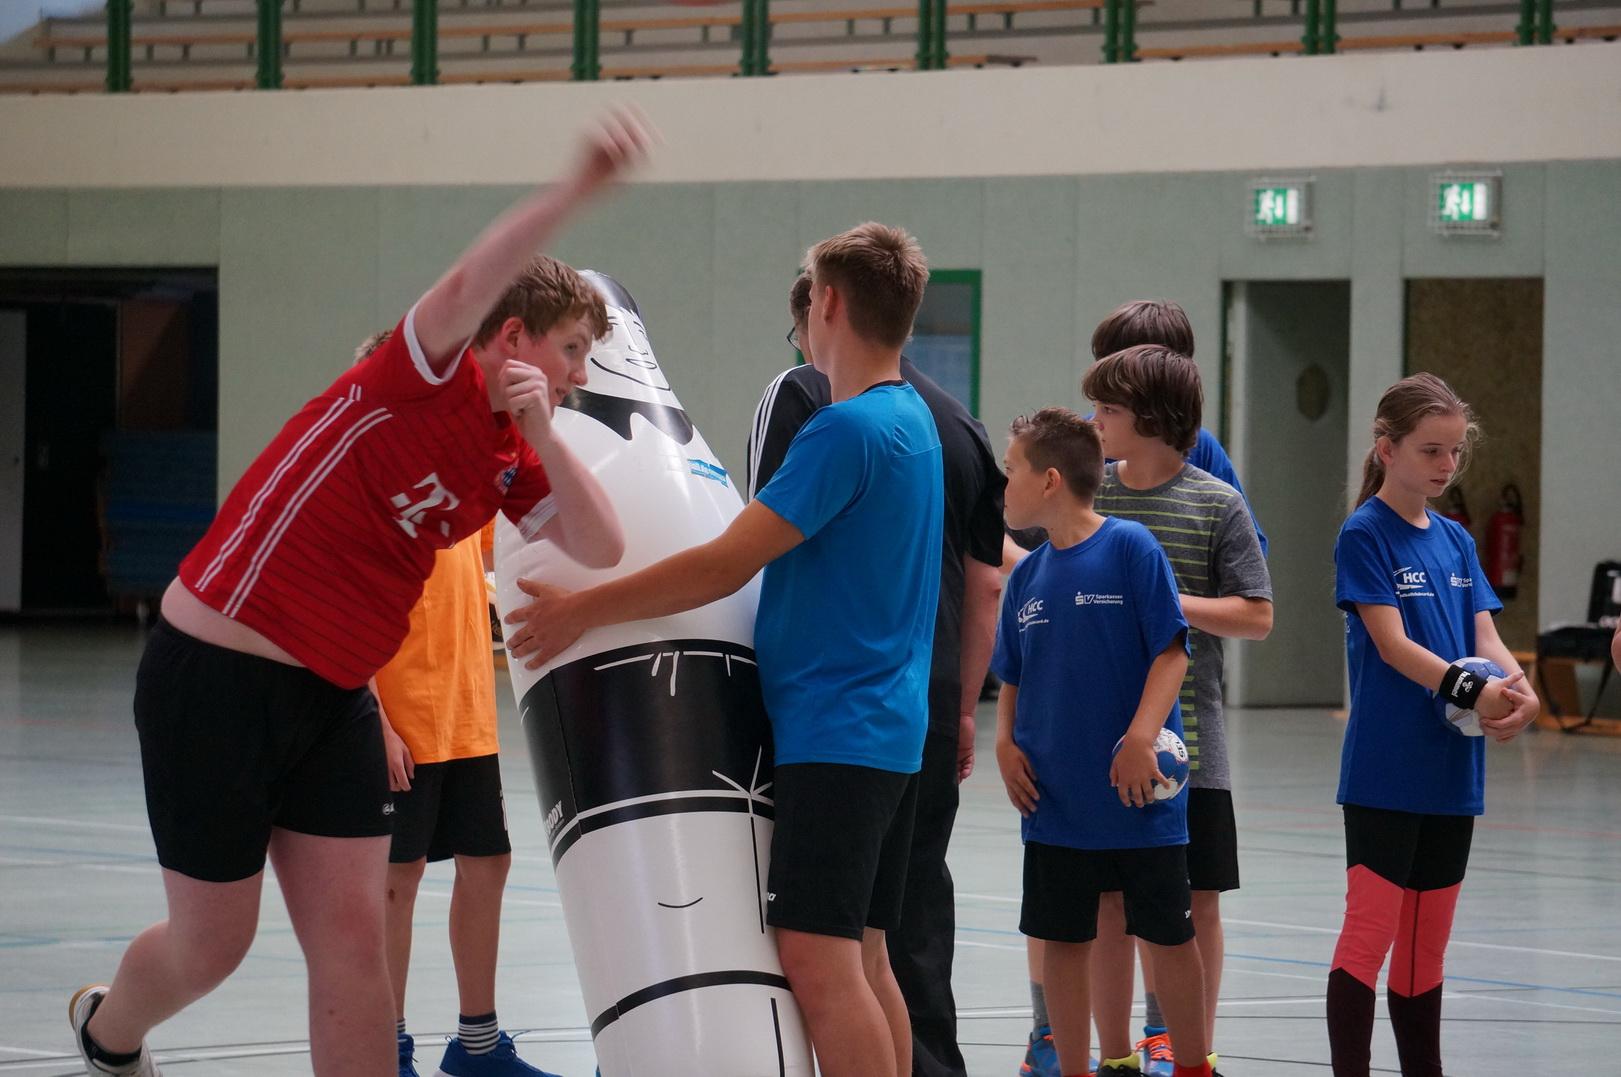 201808_Handballcamp_SDH_MG_221w